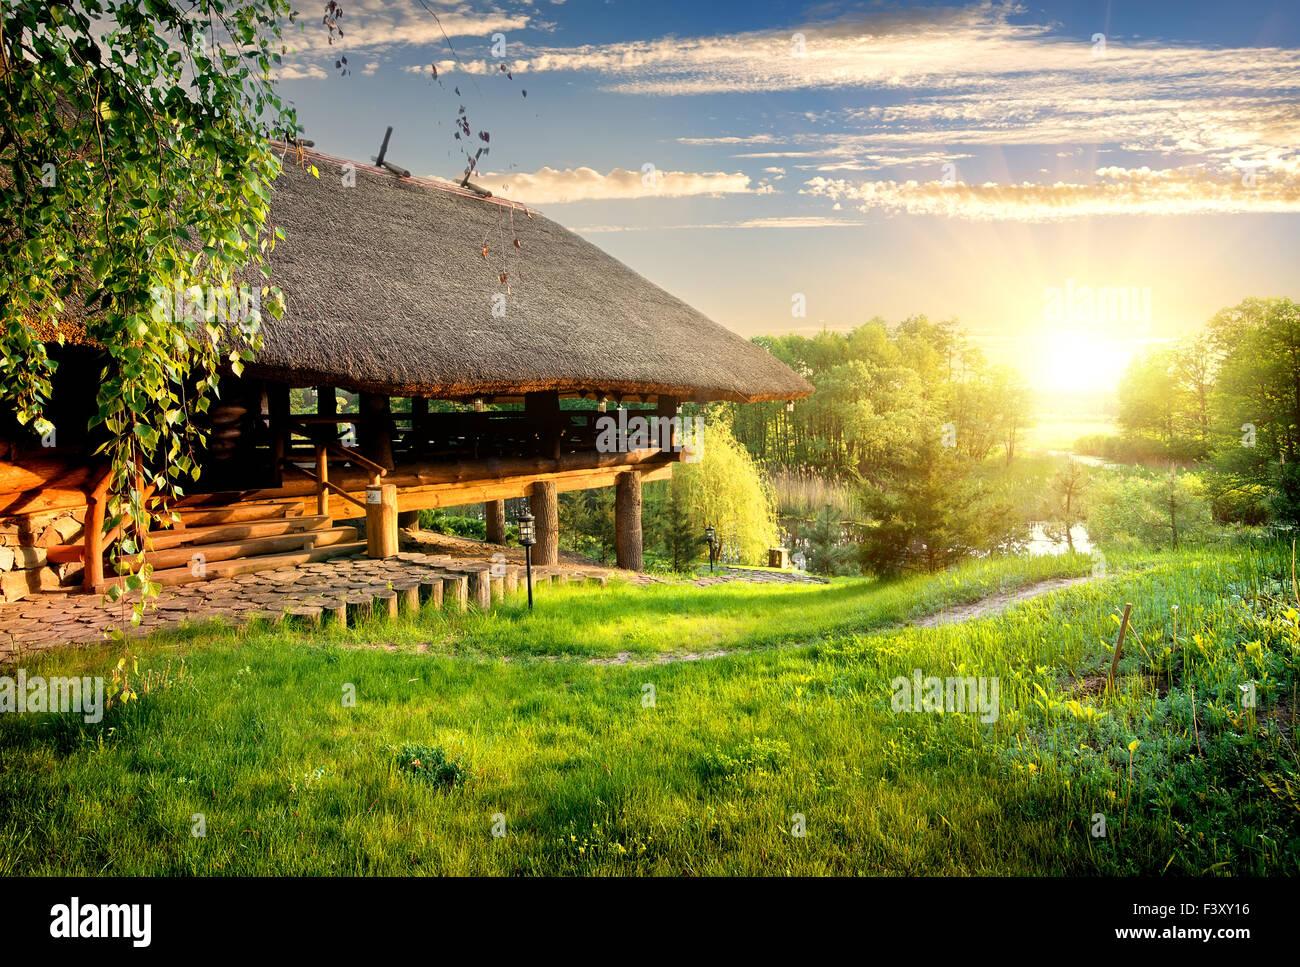 Casa de log, cerca del lago al atardecer Imagen De Stock